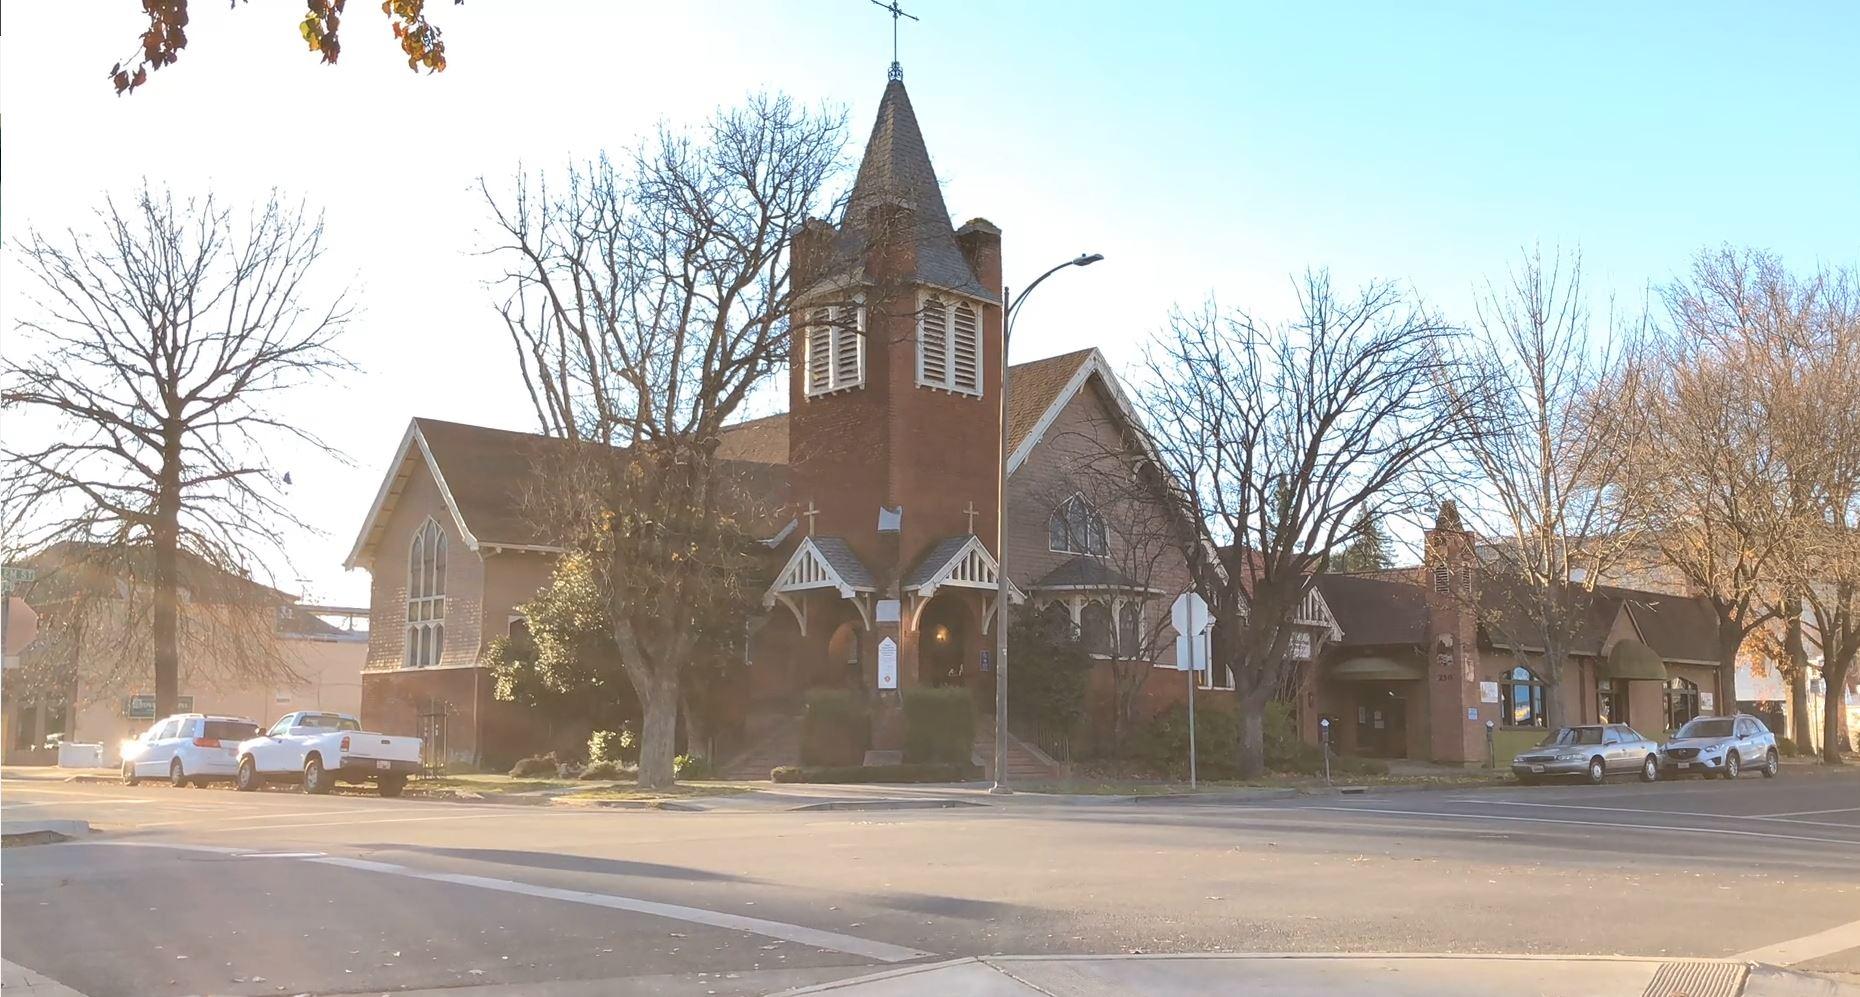 2017-12-28 20_41_07-Sovereign Joy Church shot on Vimeo.jpg